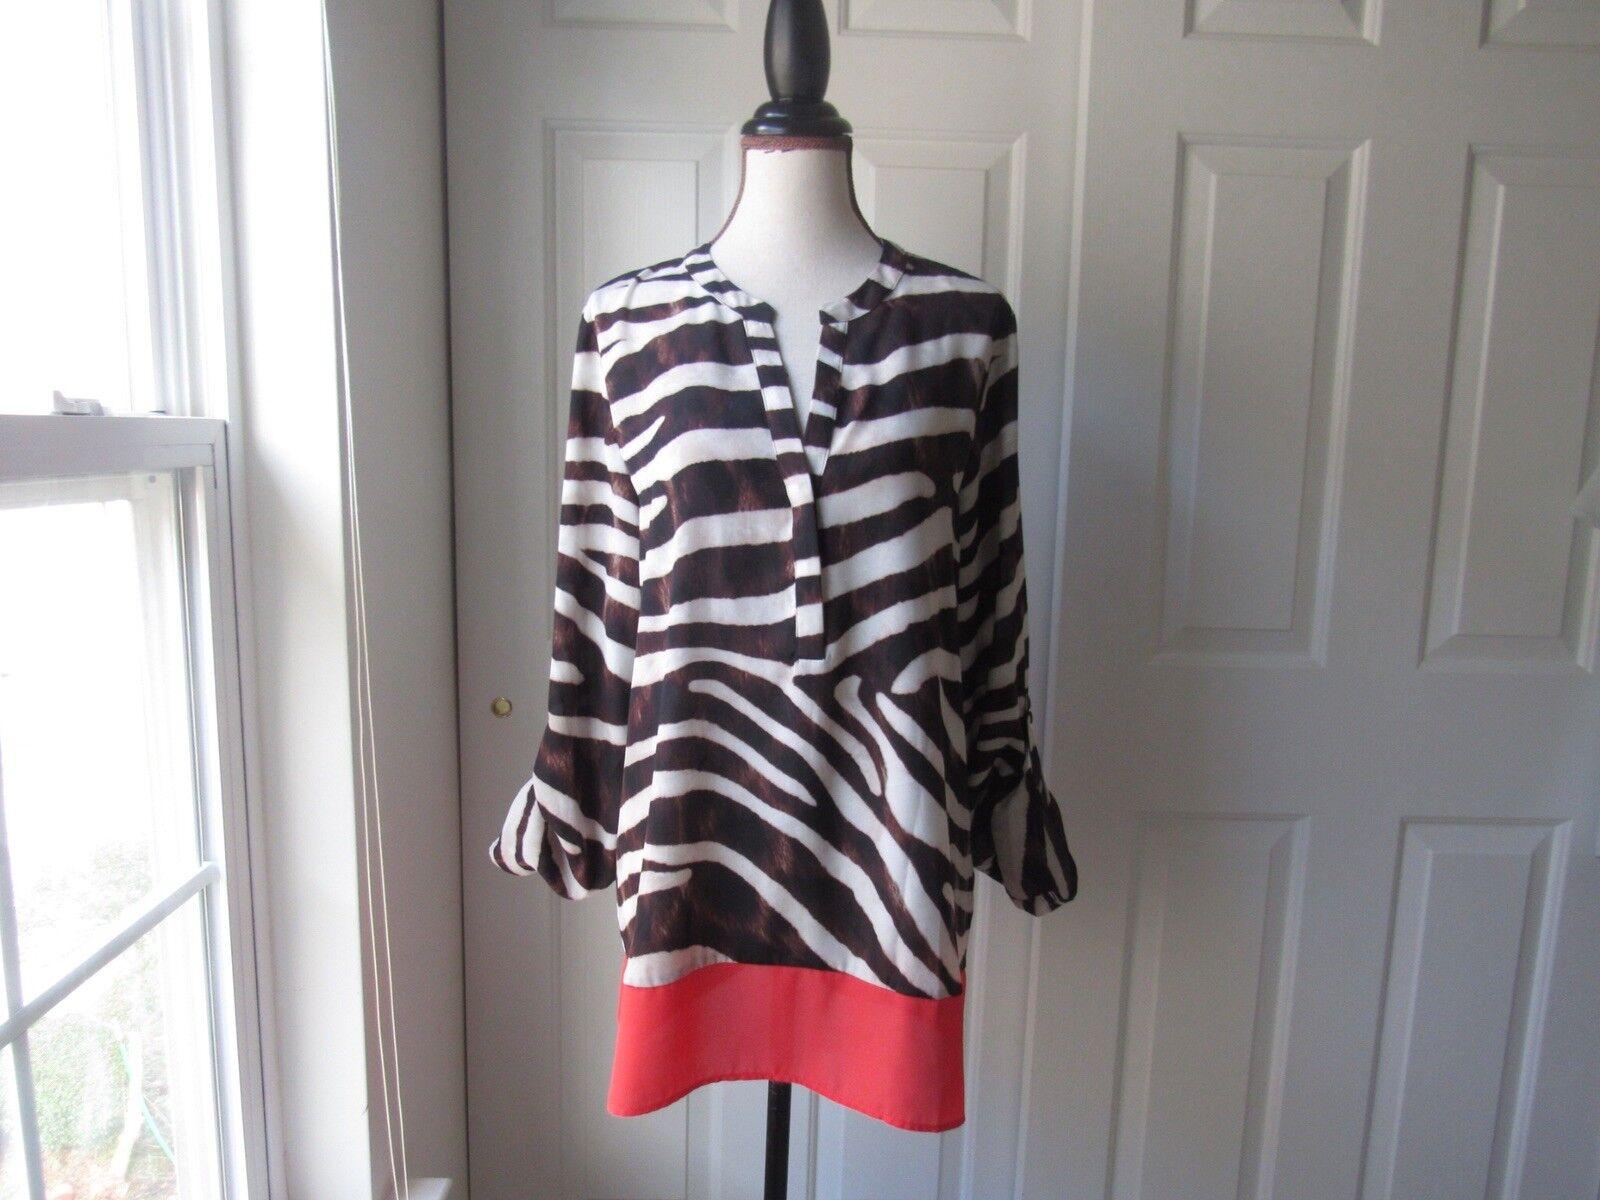 Size L-ZAC & RACHEL Zebra Print Tunic Top Brown, White, & Hot Pink Long Sleeve